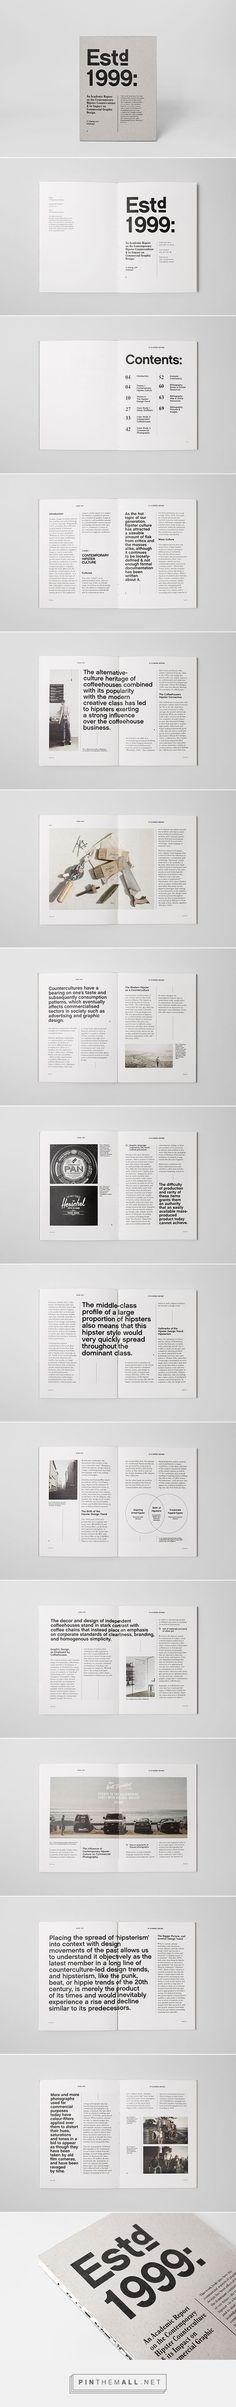 Estd 1999: An Academic Report by Sidney Lim YX: